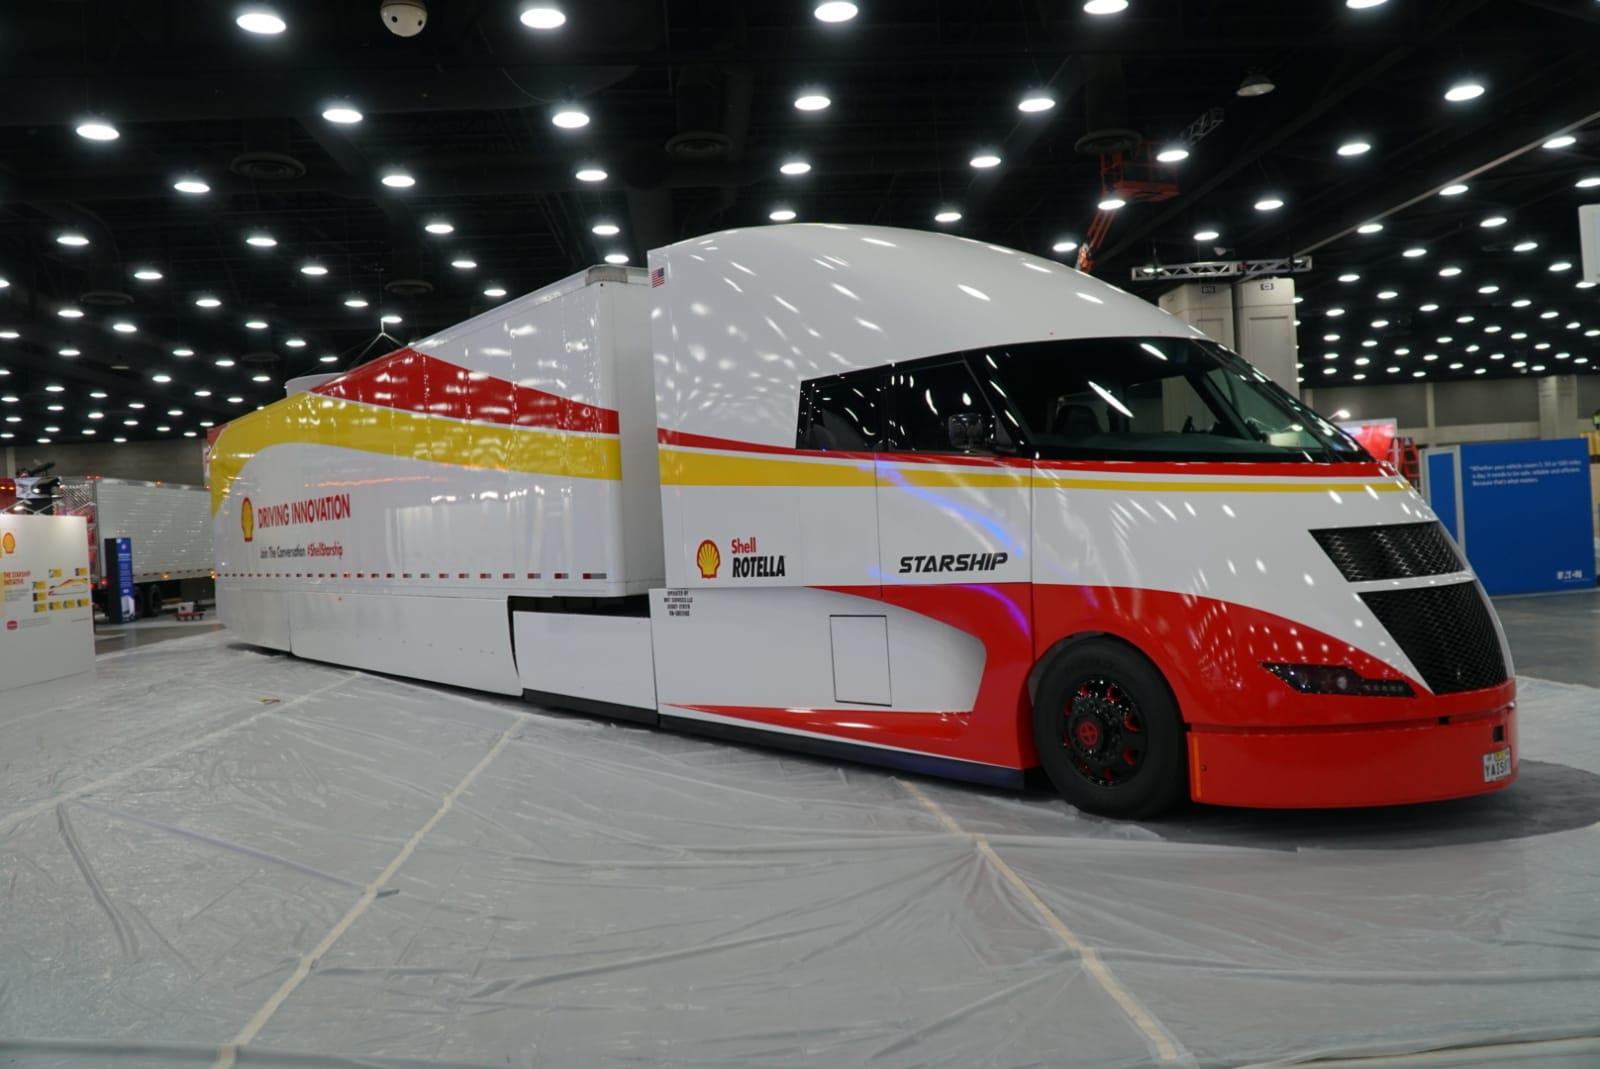 starship airflow truck  mid american truckshow iepieleaks